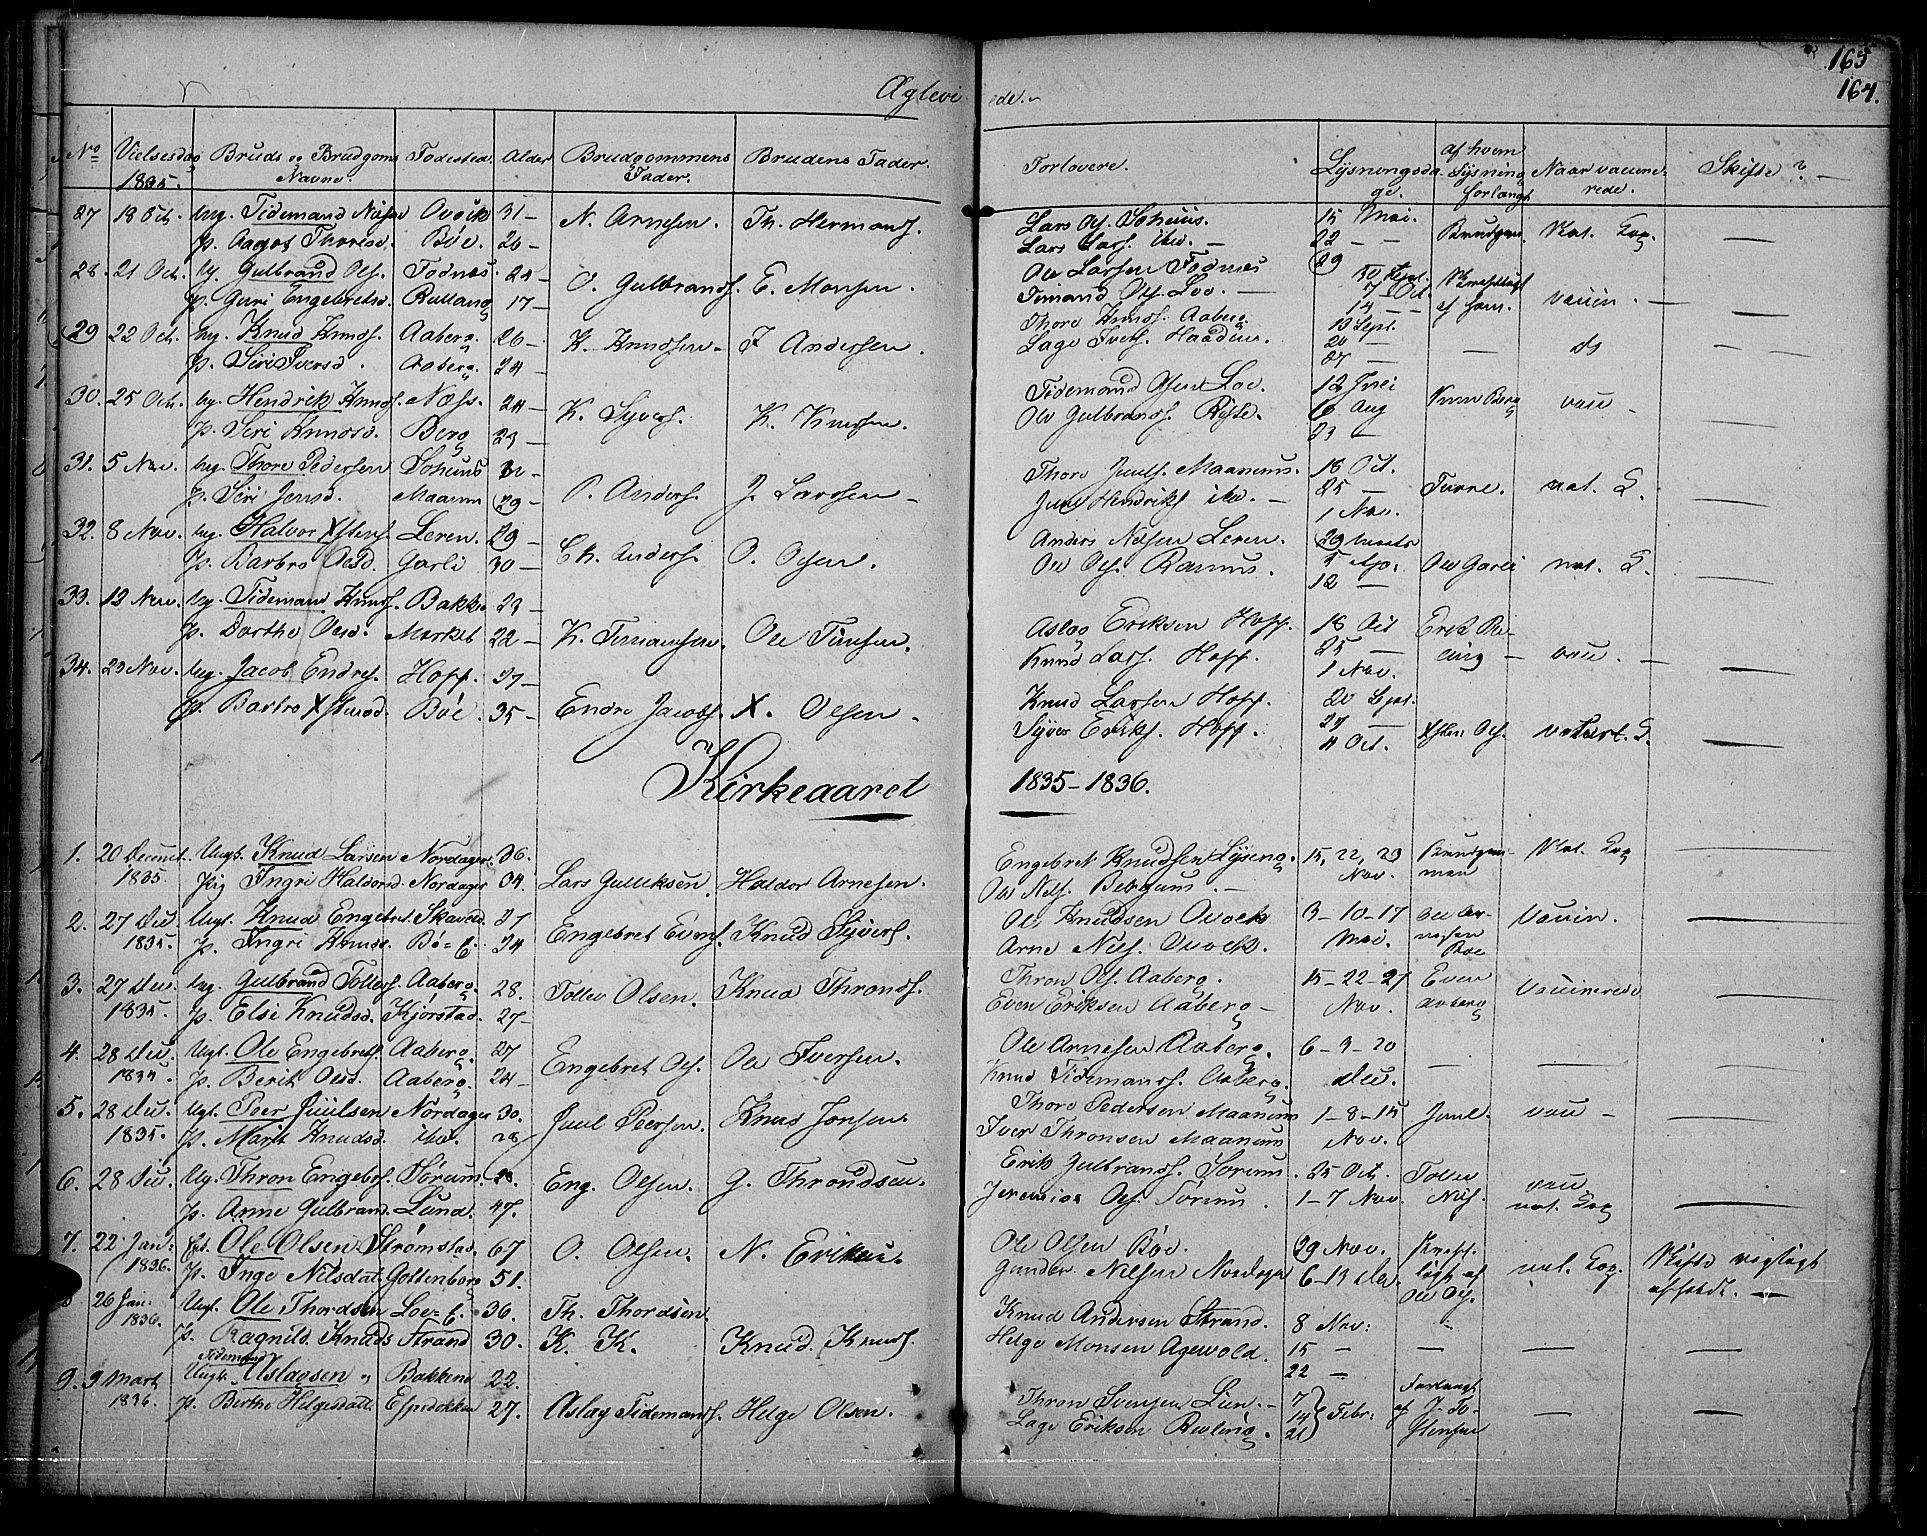 SAH, Nord-Aurdal prestekontor, Ministerialbok nr. 3, 1828-1841, s. 164